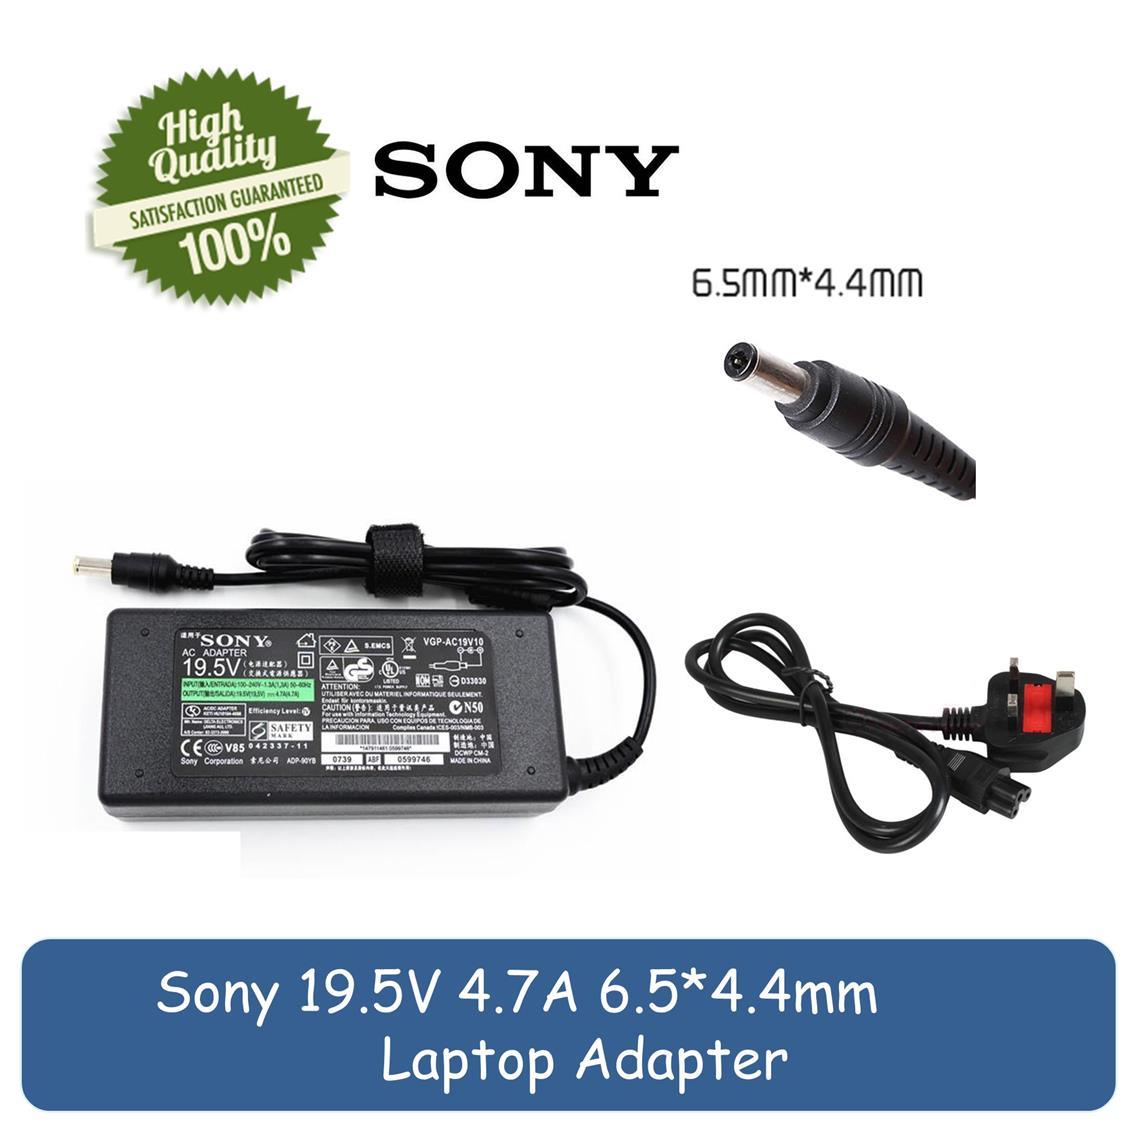 Sony 195v 47a Vaio Vgn S3 Vgn S4 Vgn S5 Vgn Sz 90w Laptop Ac Adapter